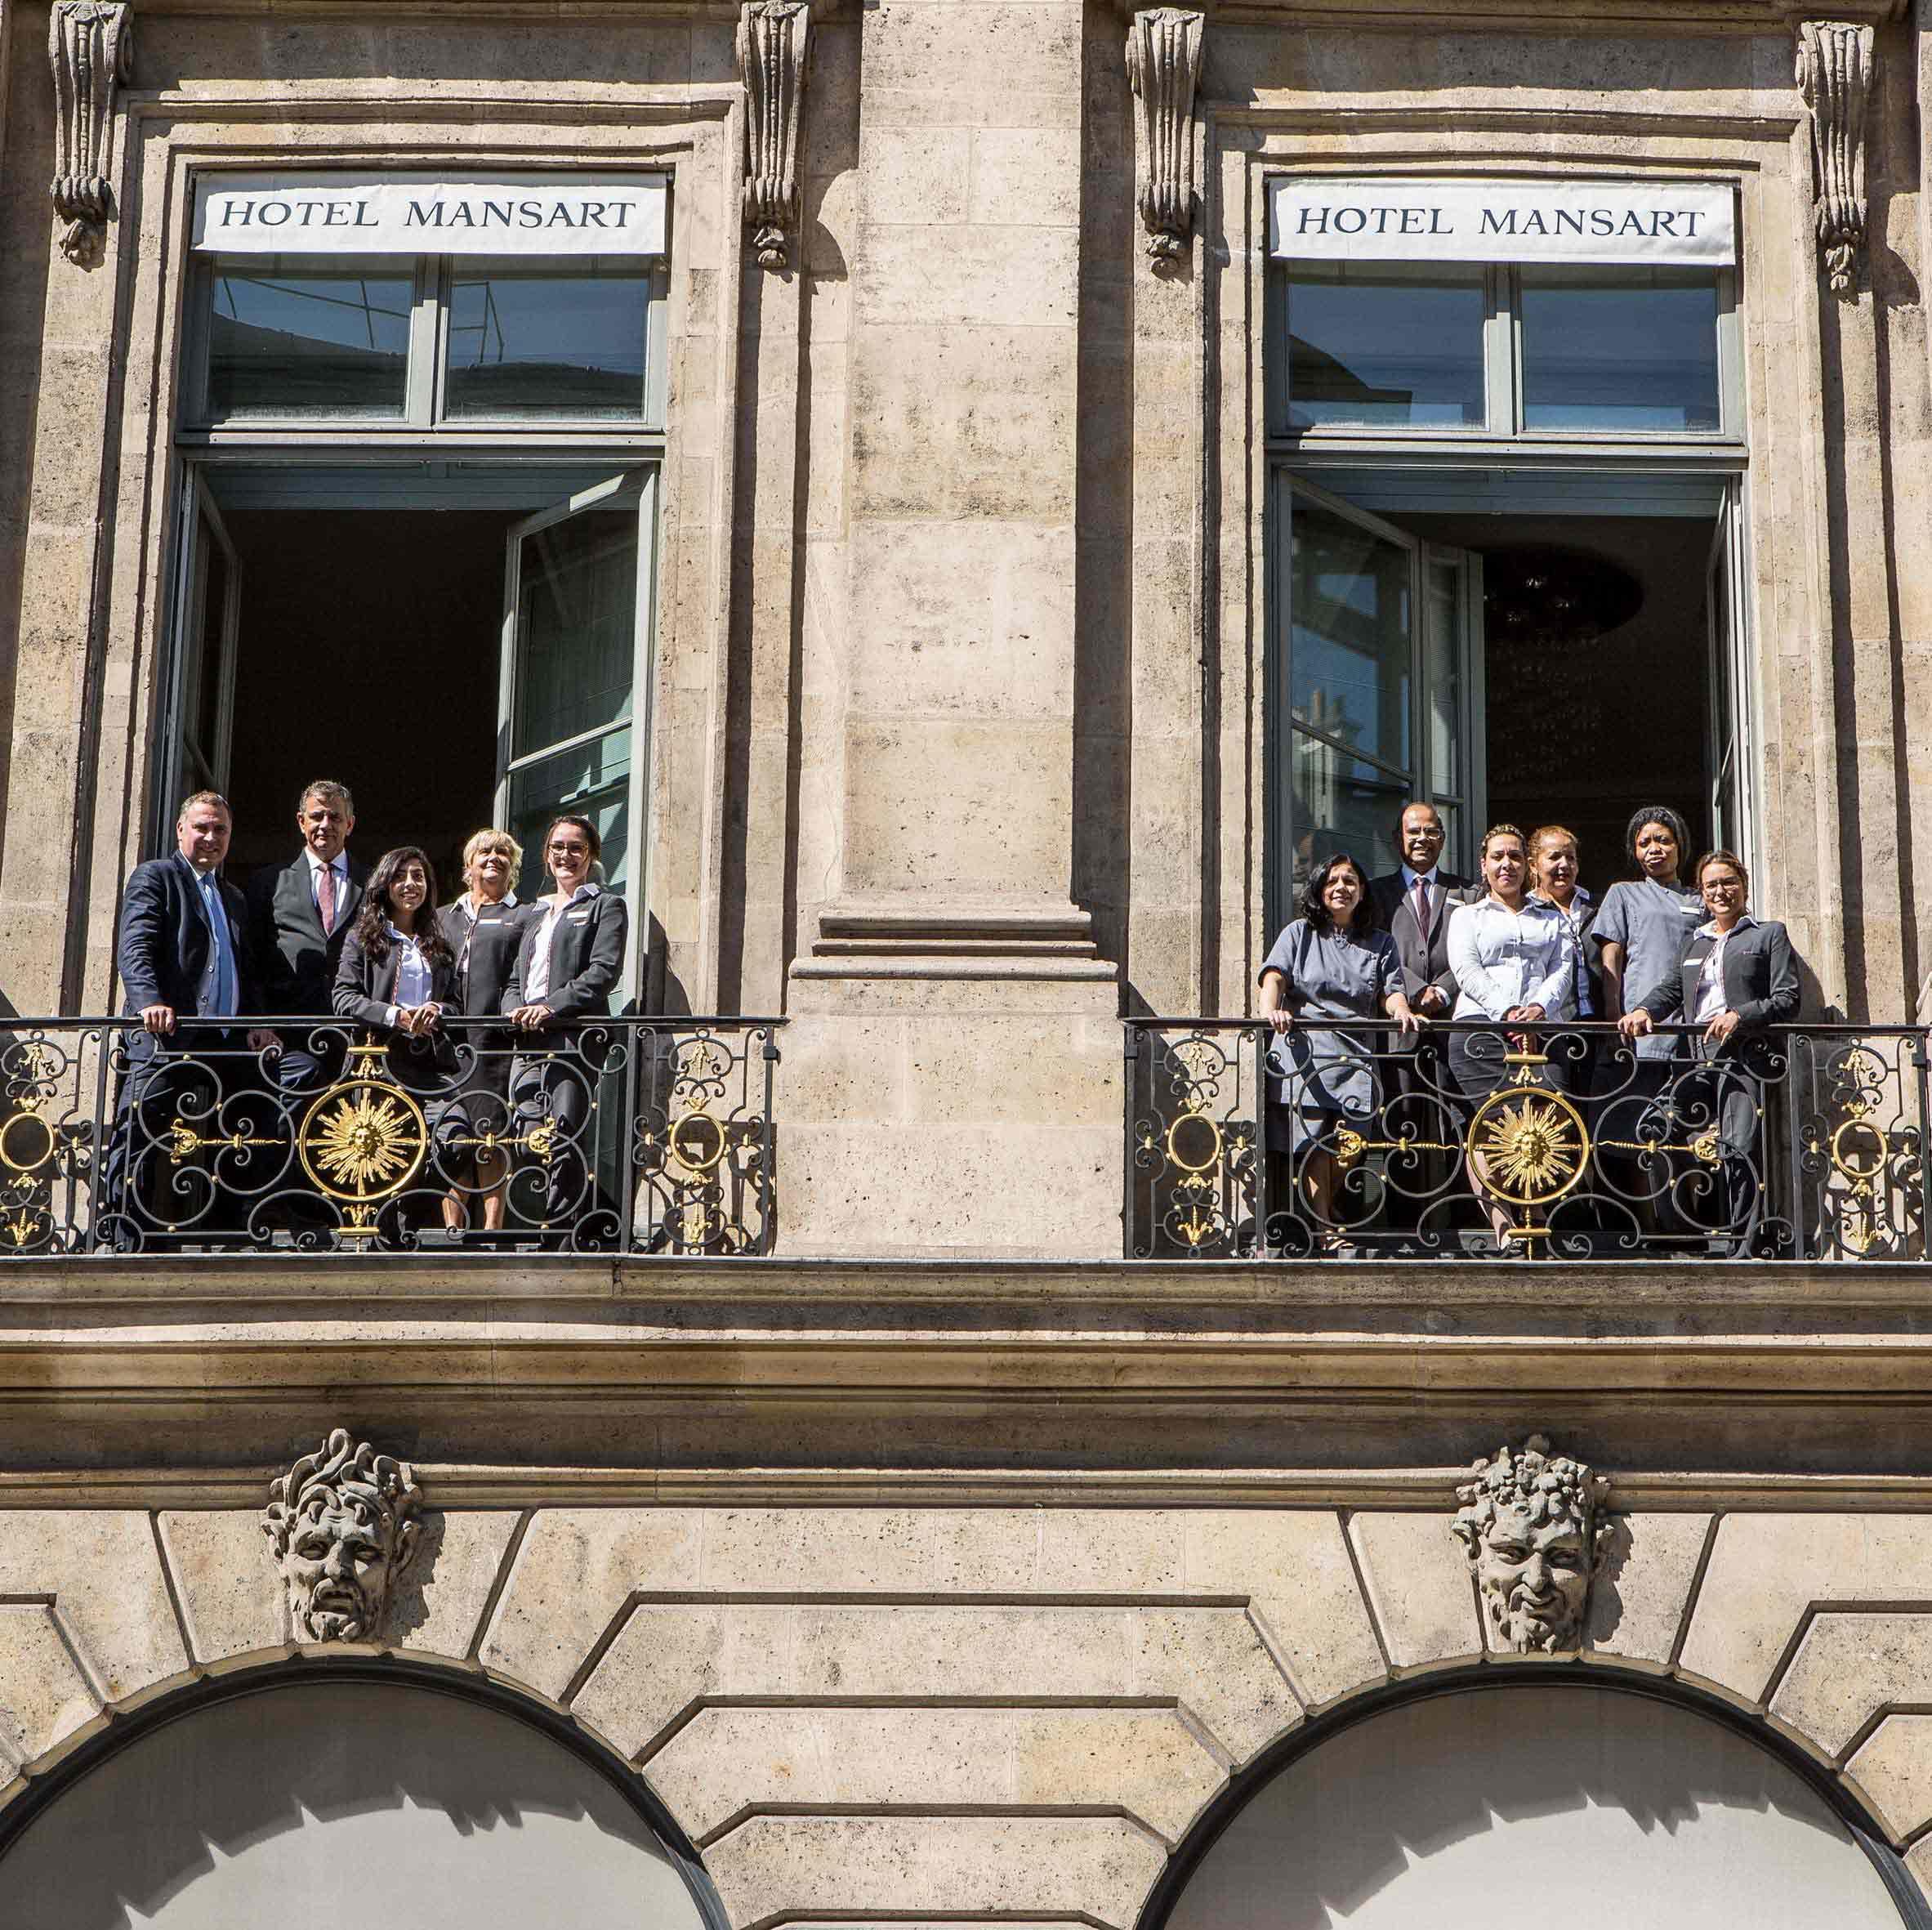 l'equipe de l'hôtel Mansart